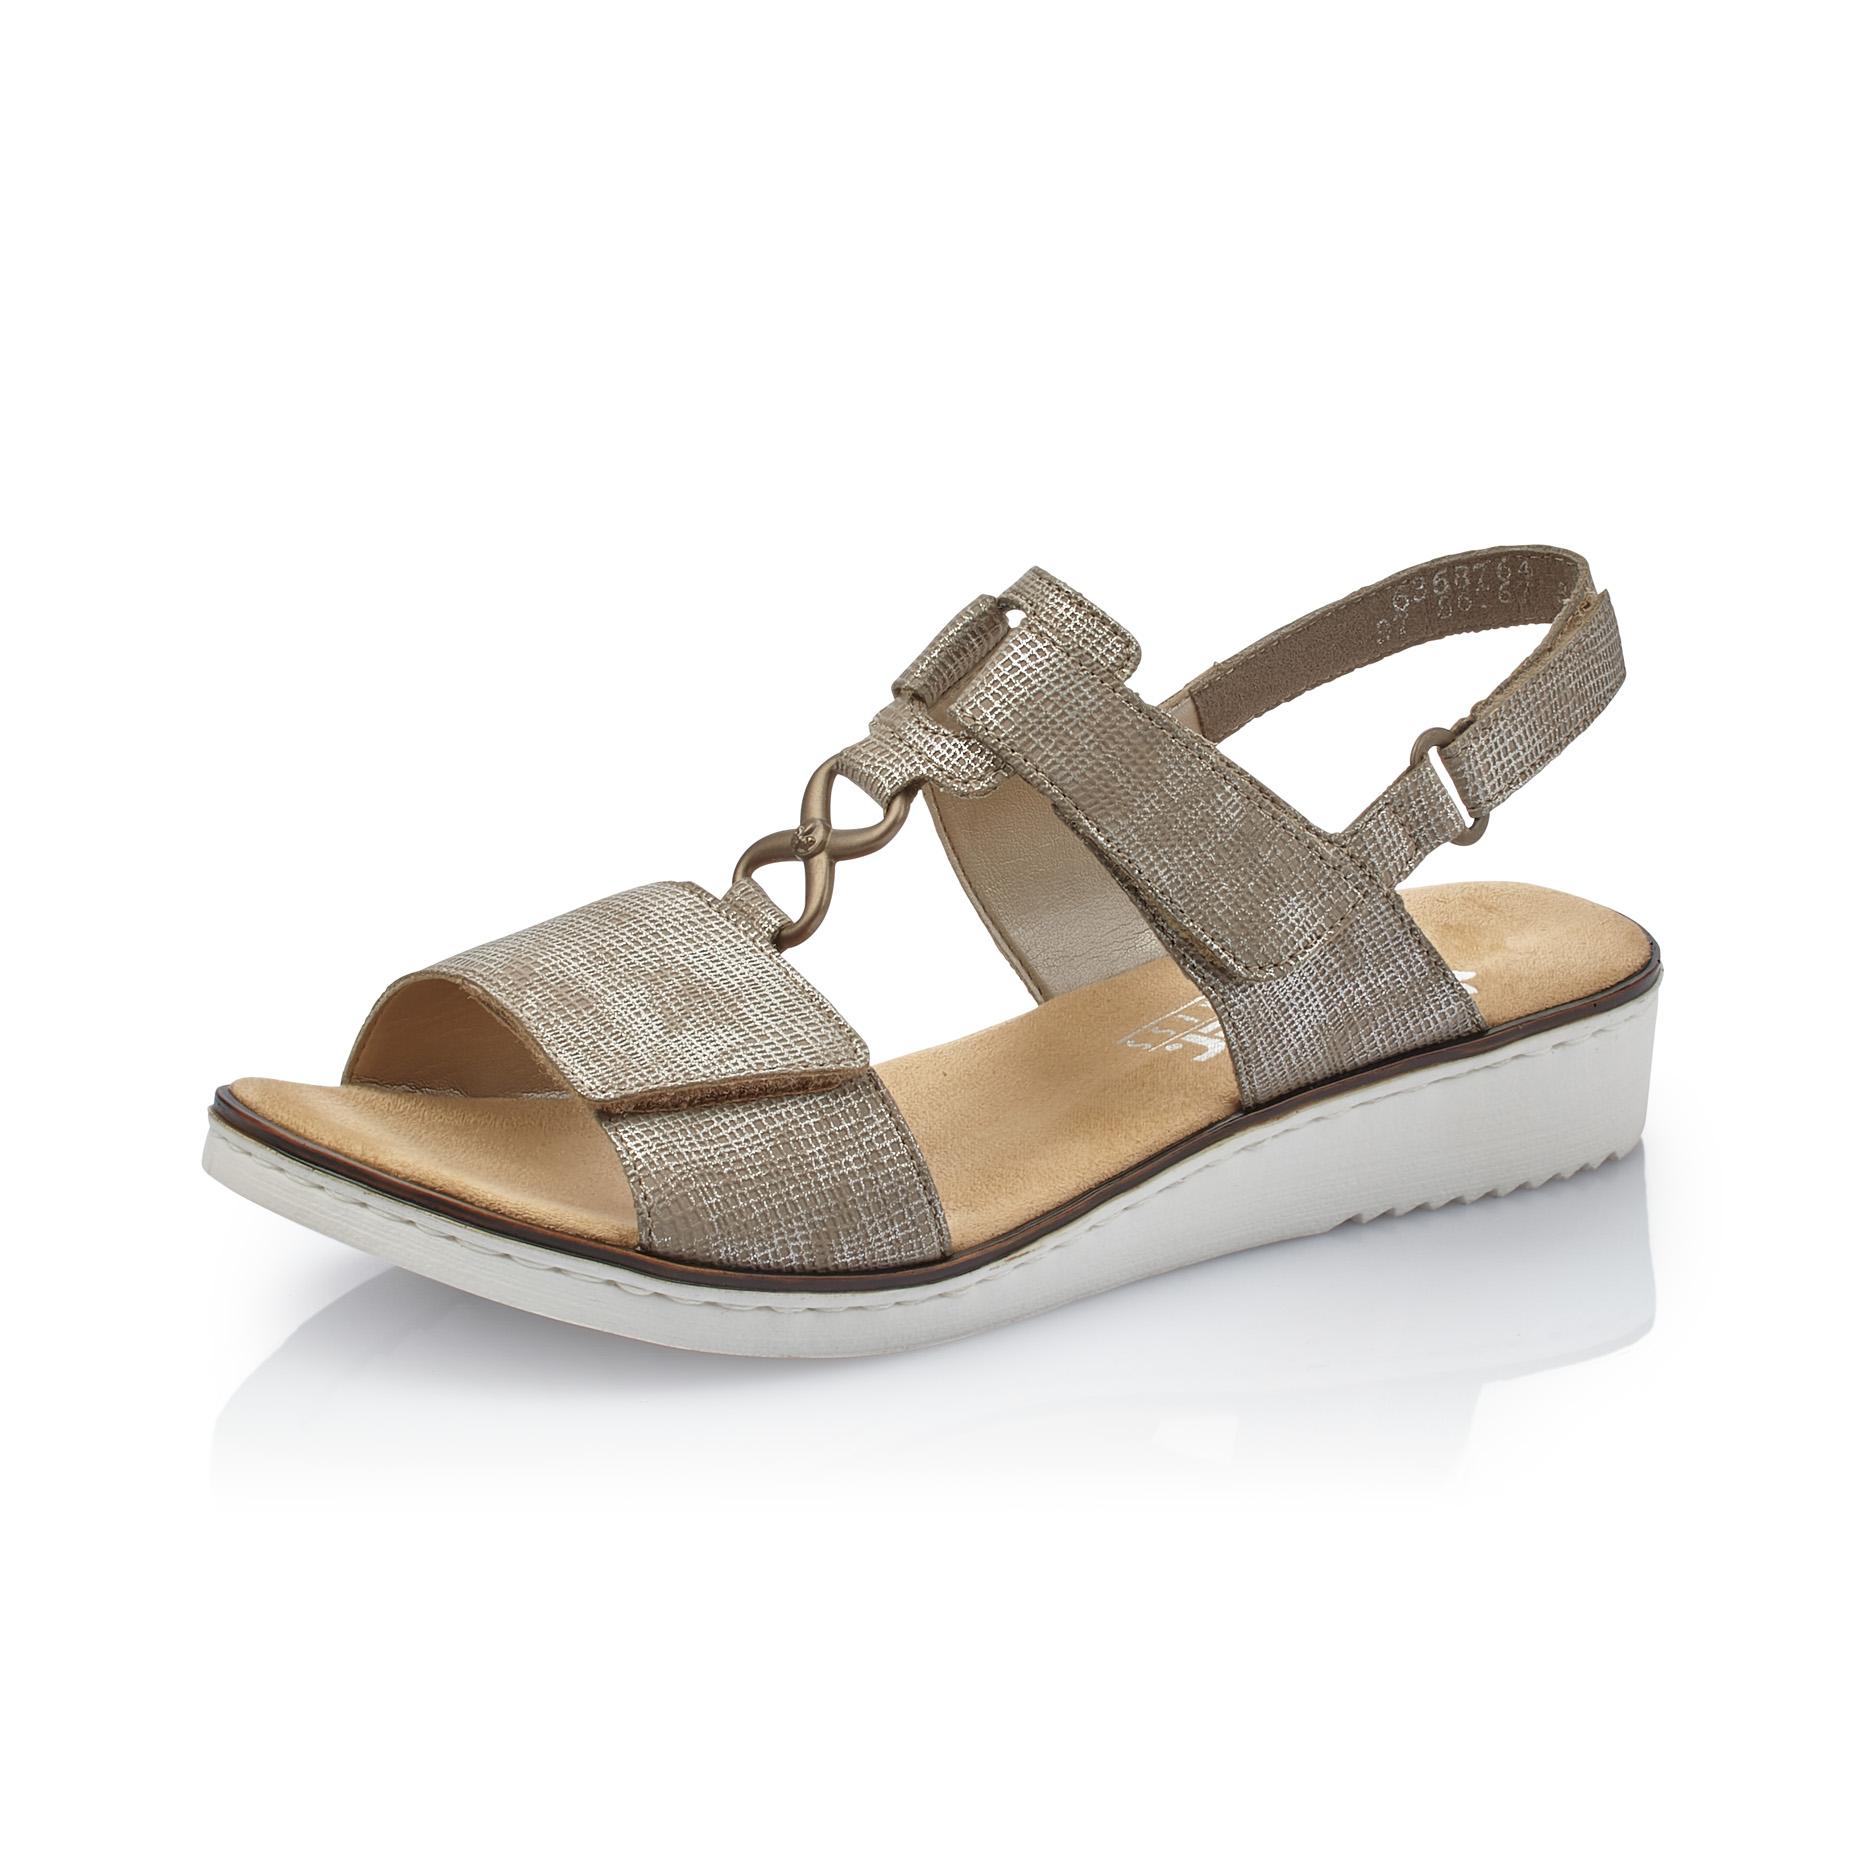 f8c4f835770 Dámská obuv RIEKER63687-64 BEIGE F S 9